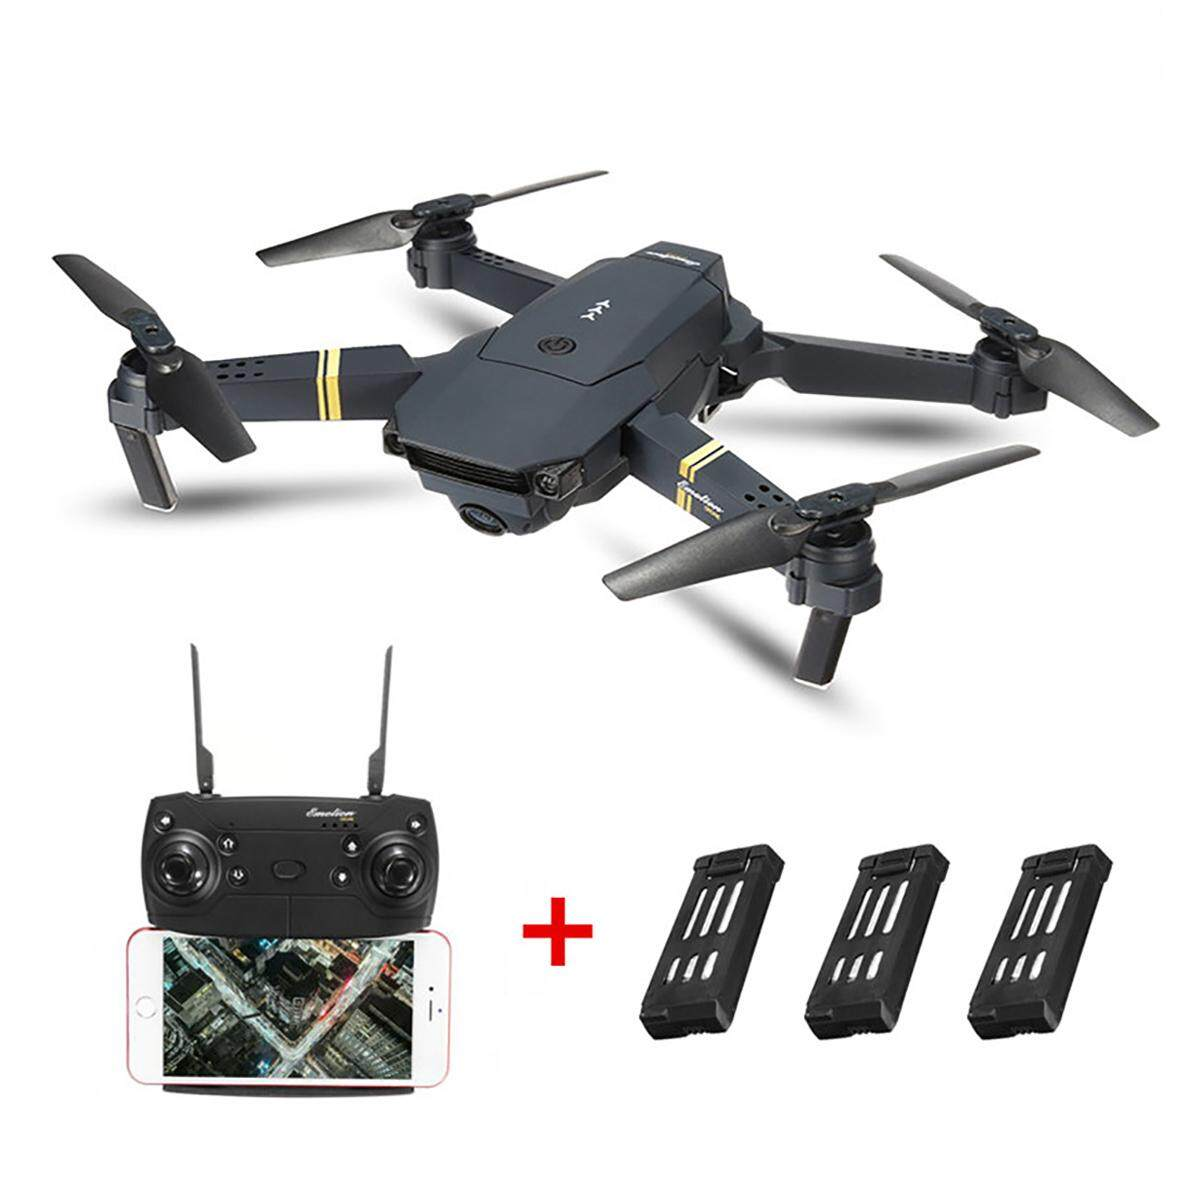 Eachine E58 Wifi FPV dengan 0.3MP Kamera Tinggi Tahan Mode Lipat Drone RC Quadcopter RTF